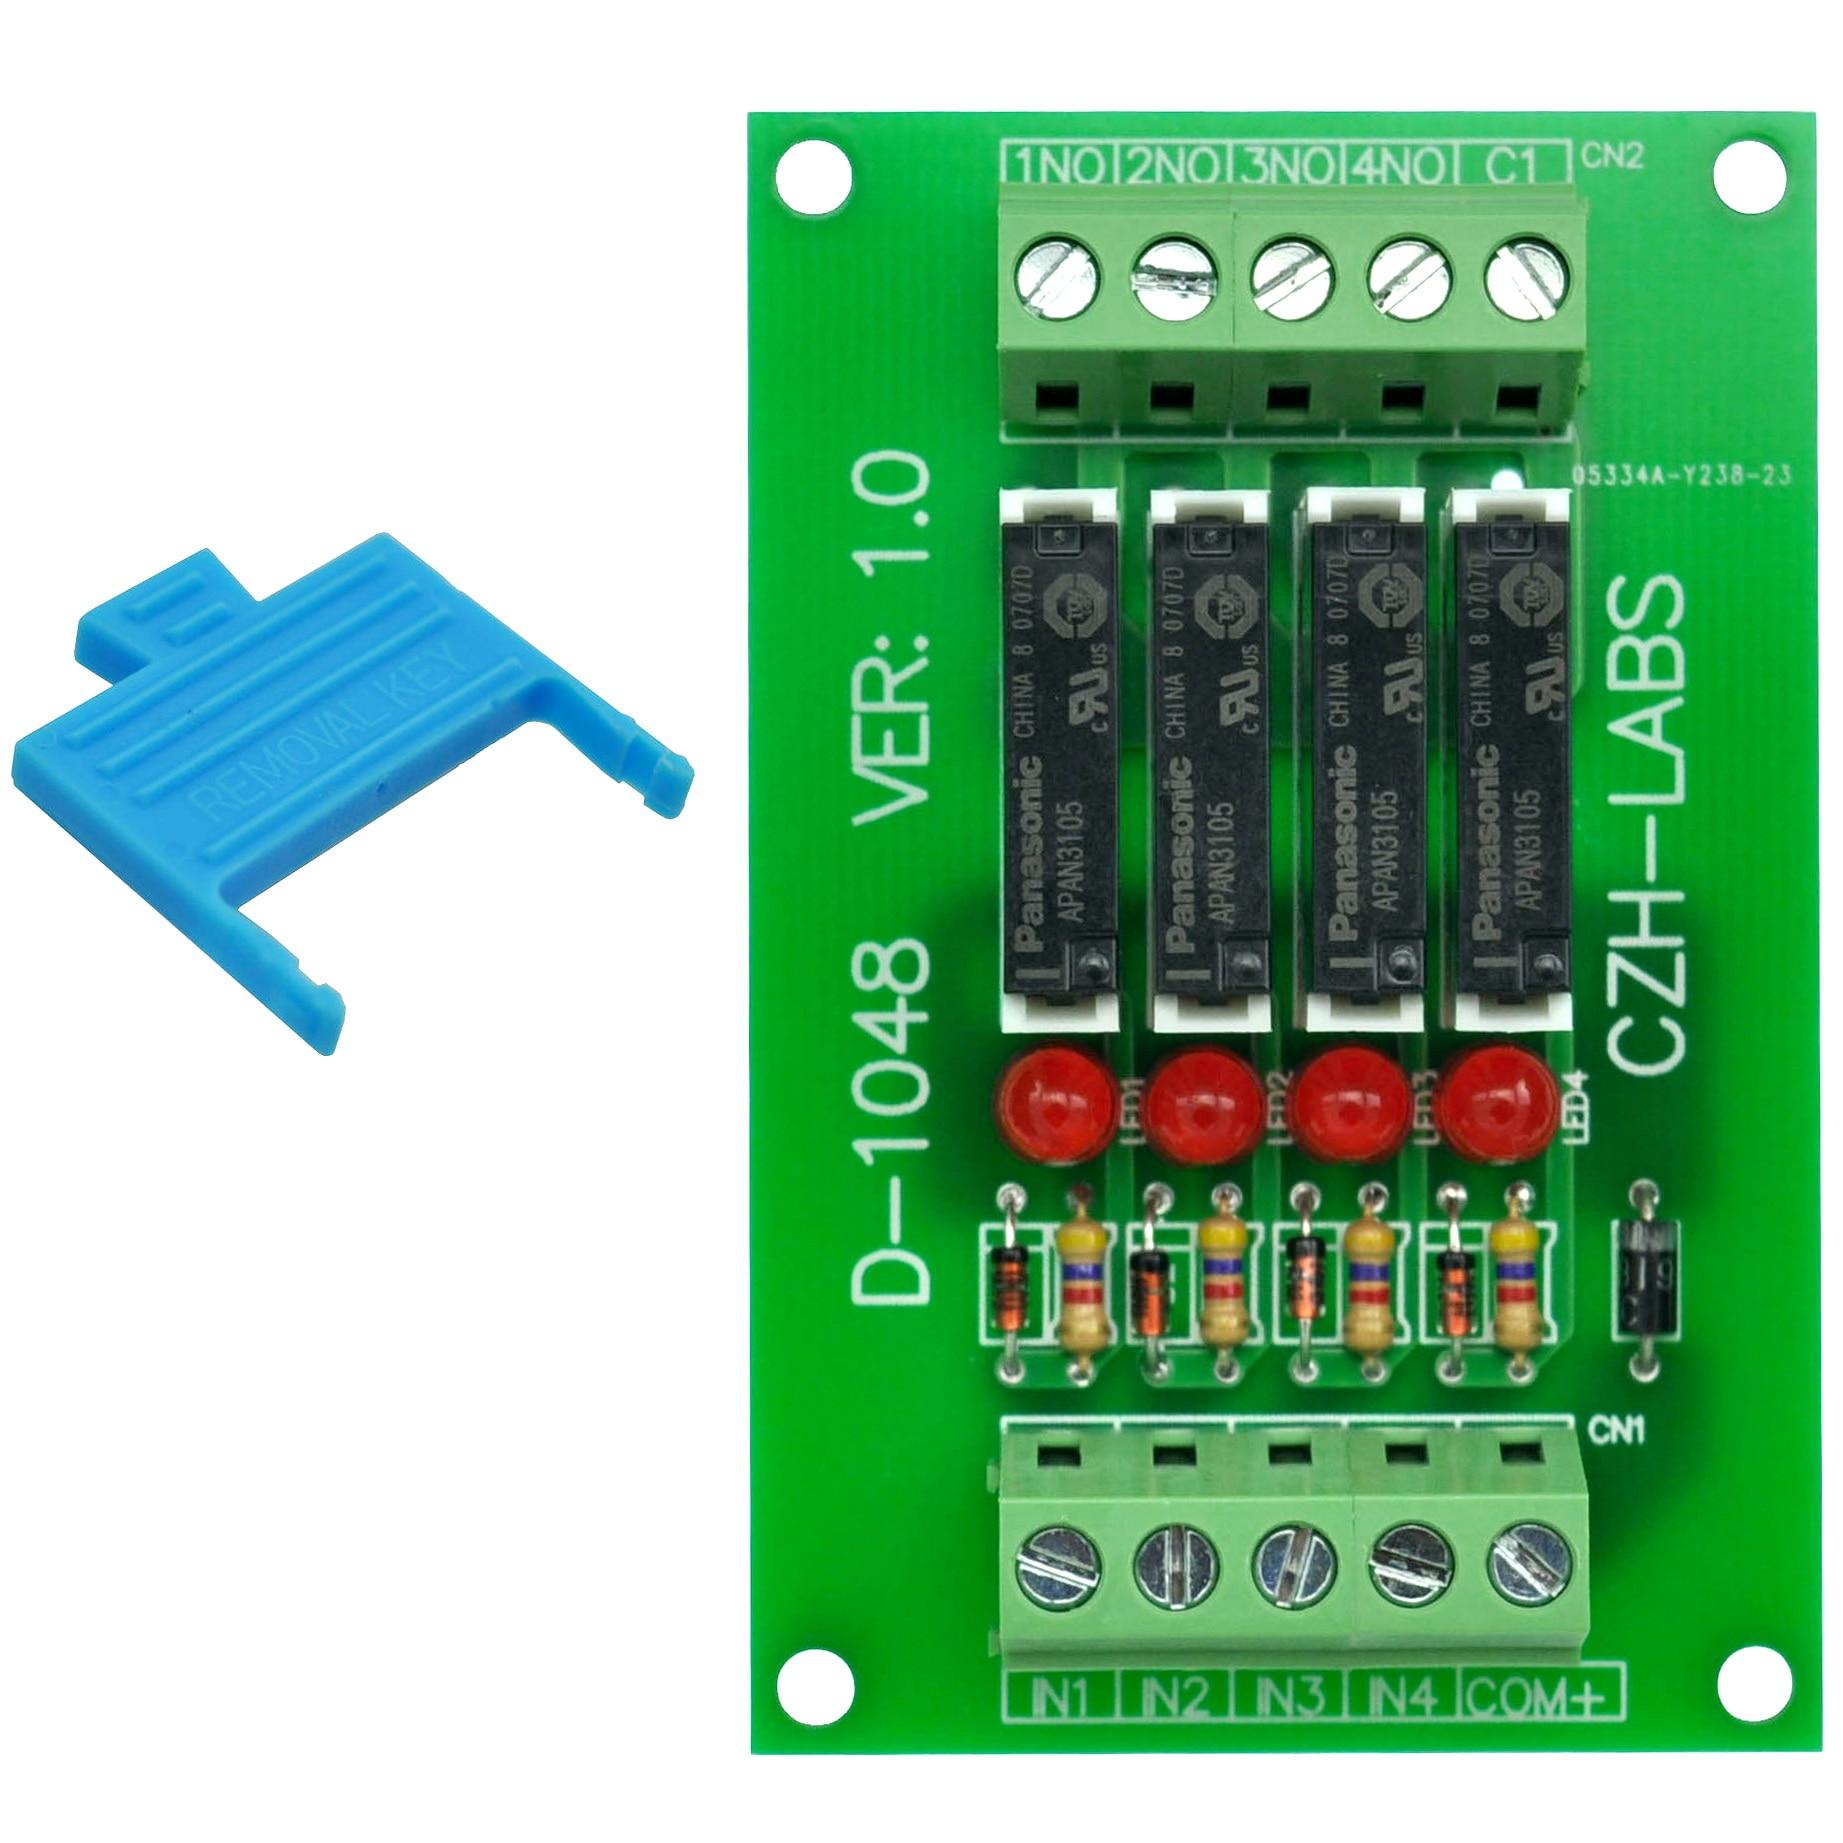 Slim Panel Mount DC5V Sink/NPN 4 SPST-NO 5A Power Relay Module, APAN3105